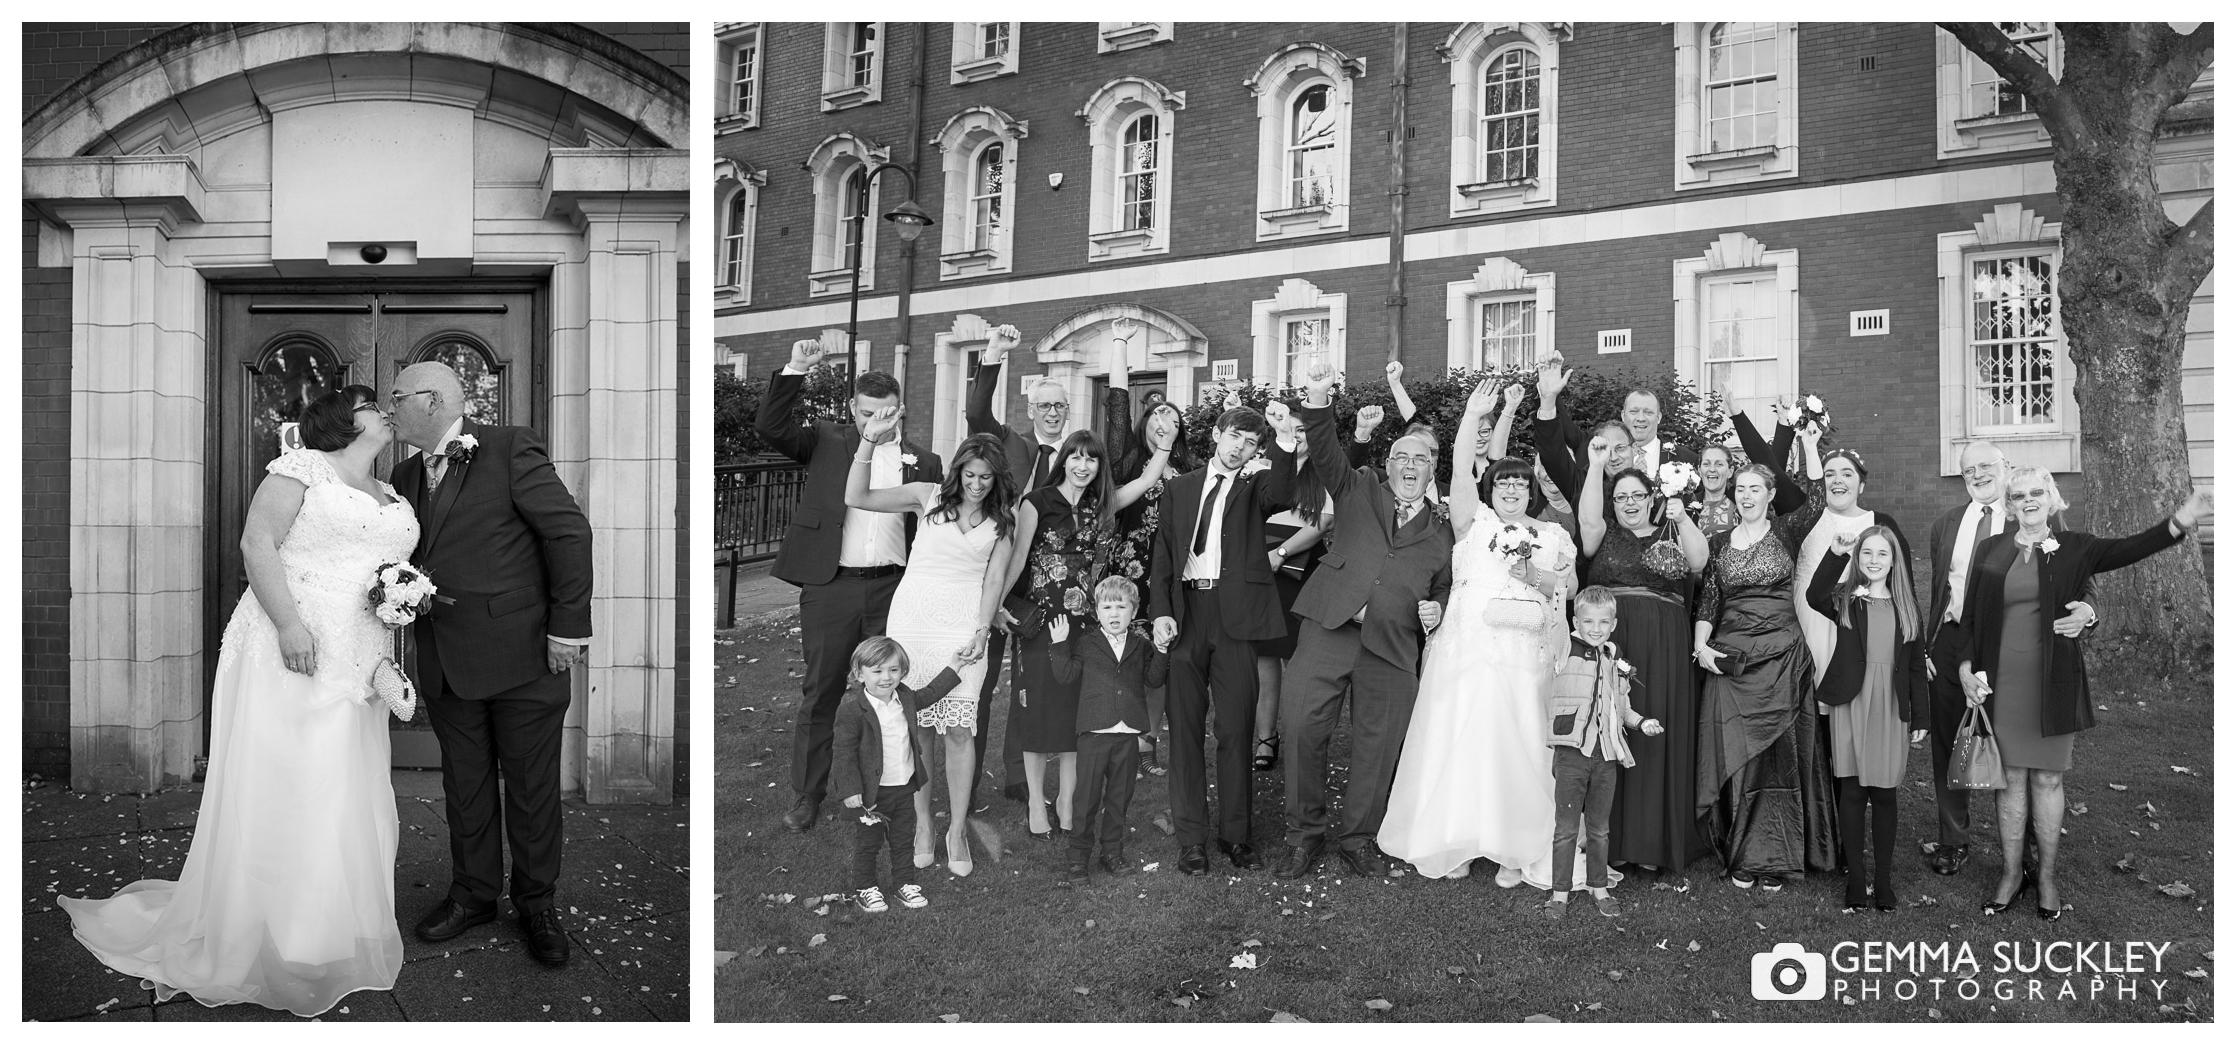 group-wedding-photo-town-hall-wedding©gemmasuckleyphotography-196.JPG